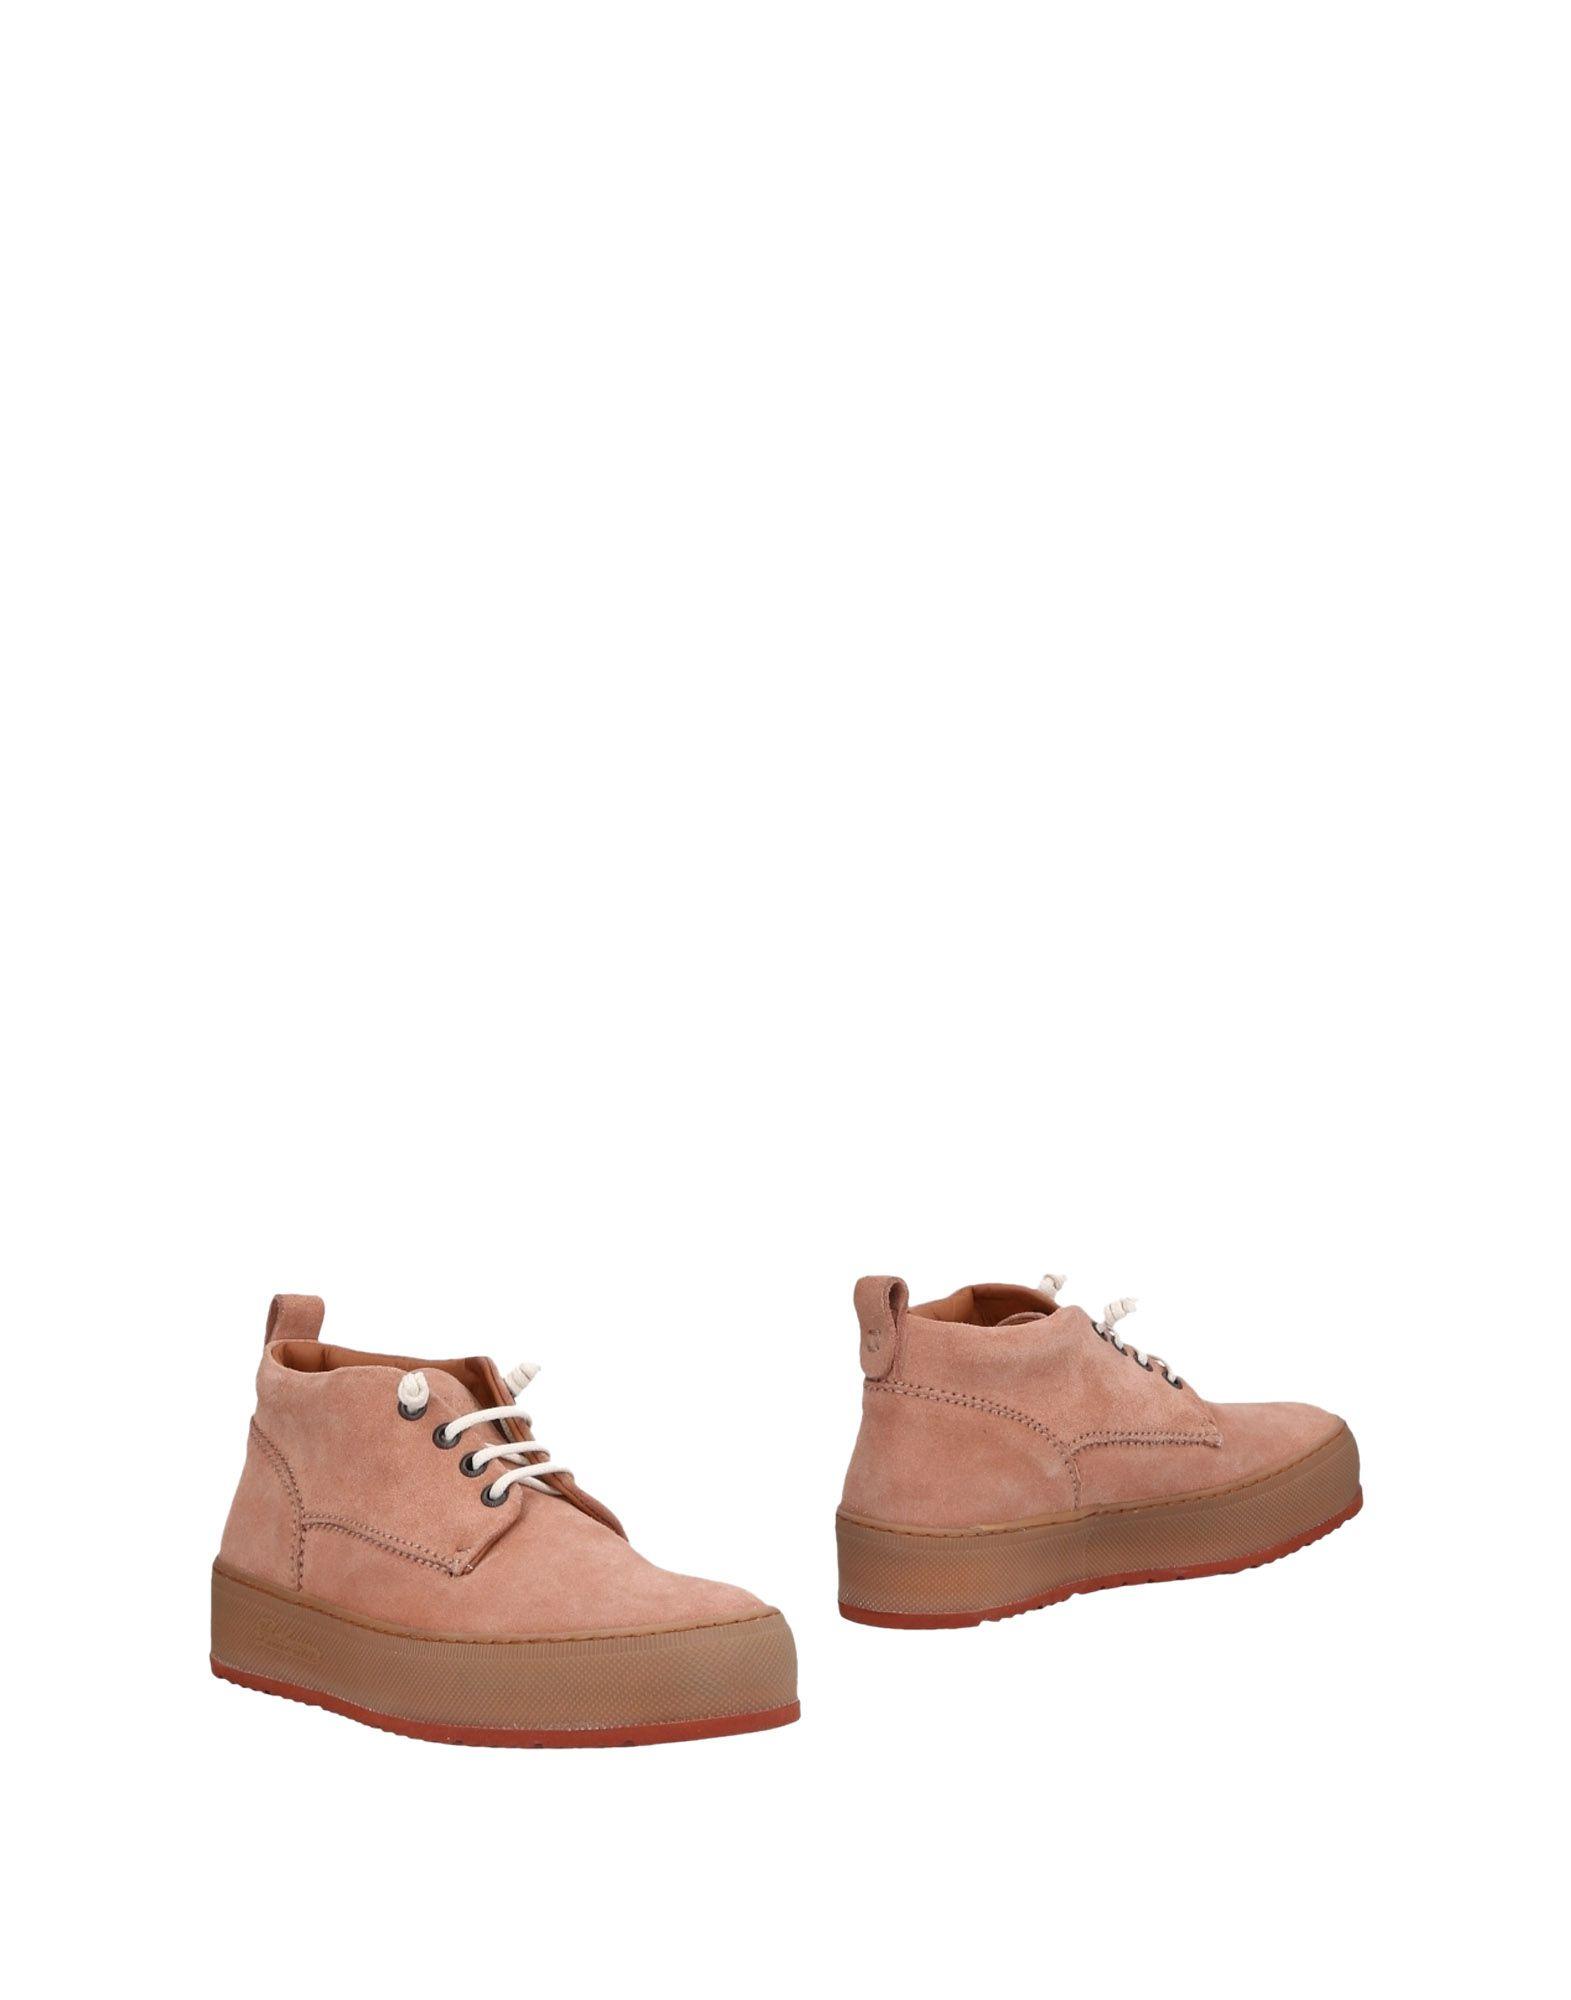 Carne Botín Barleycorn Mujer - Botines Barleycorn Los últimos últimos últimos zapatos de descuento para  hombres  y mujeres 11609e